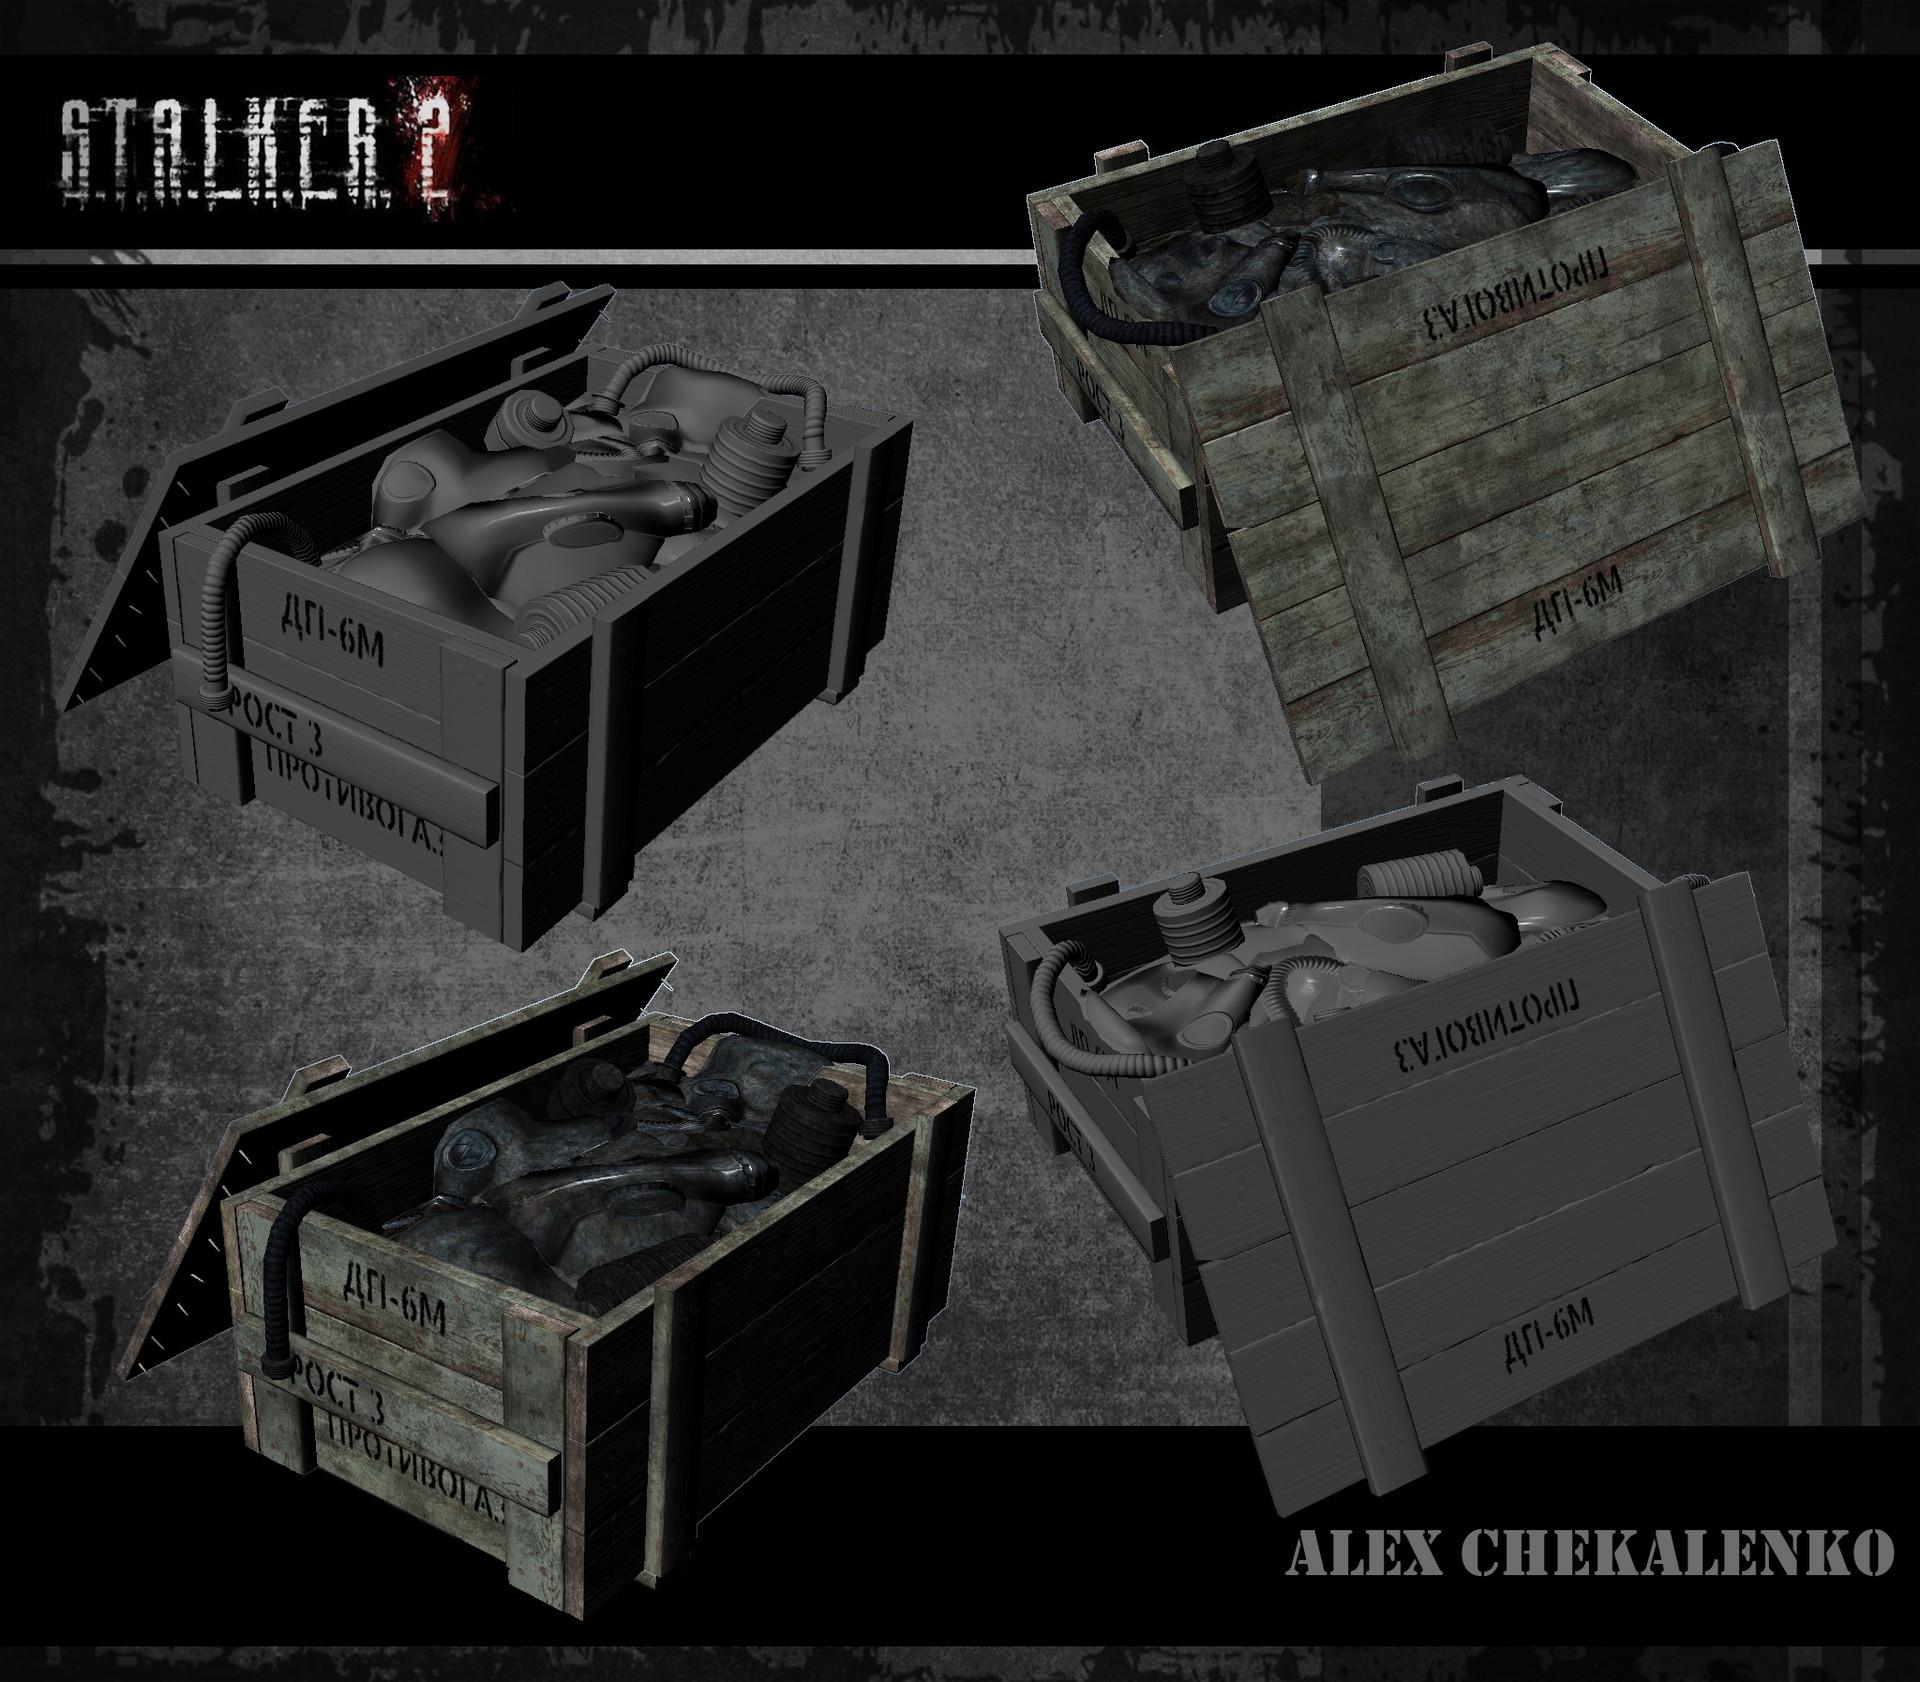 Alex chekalenko gasmask crate